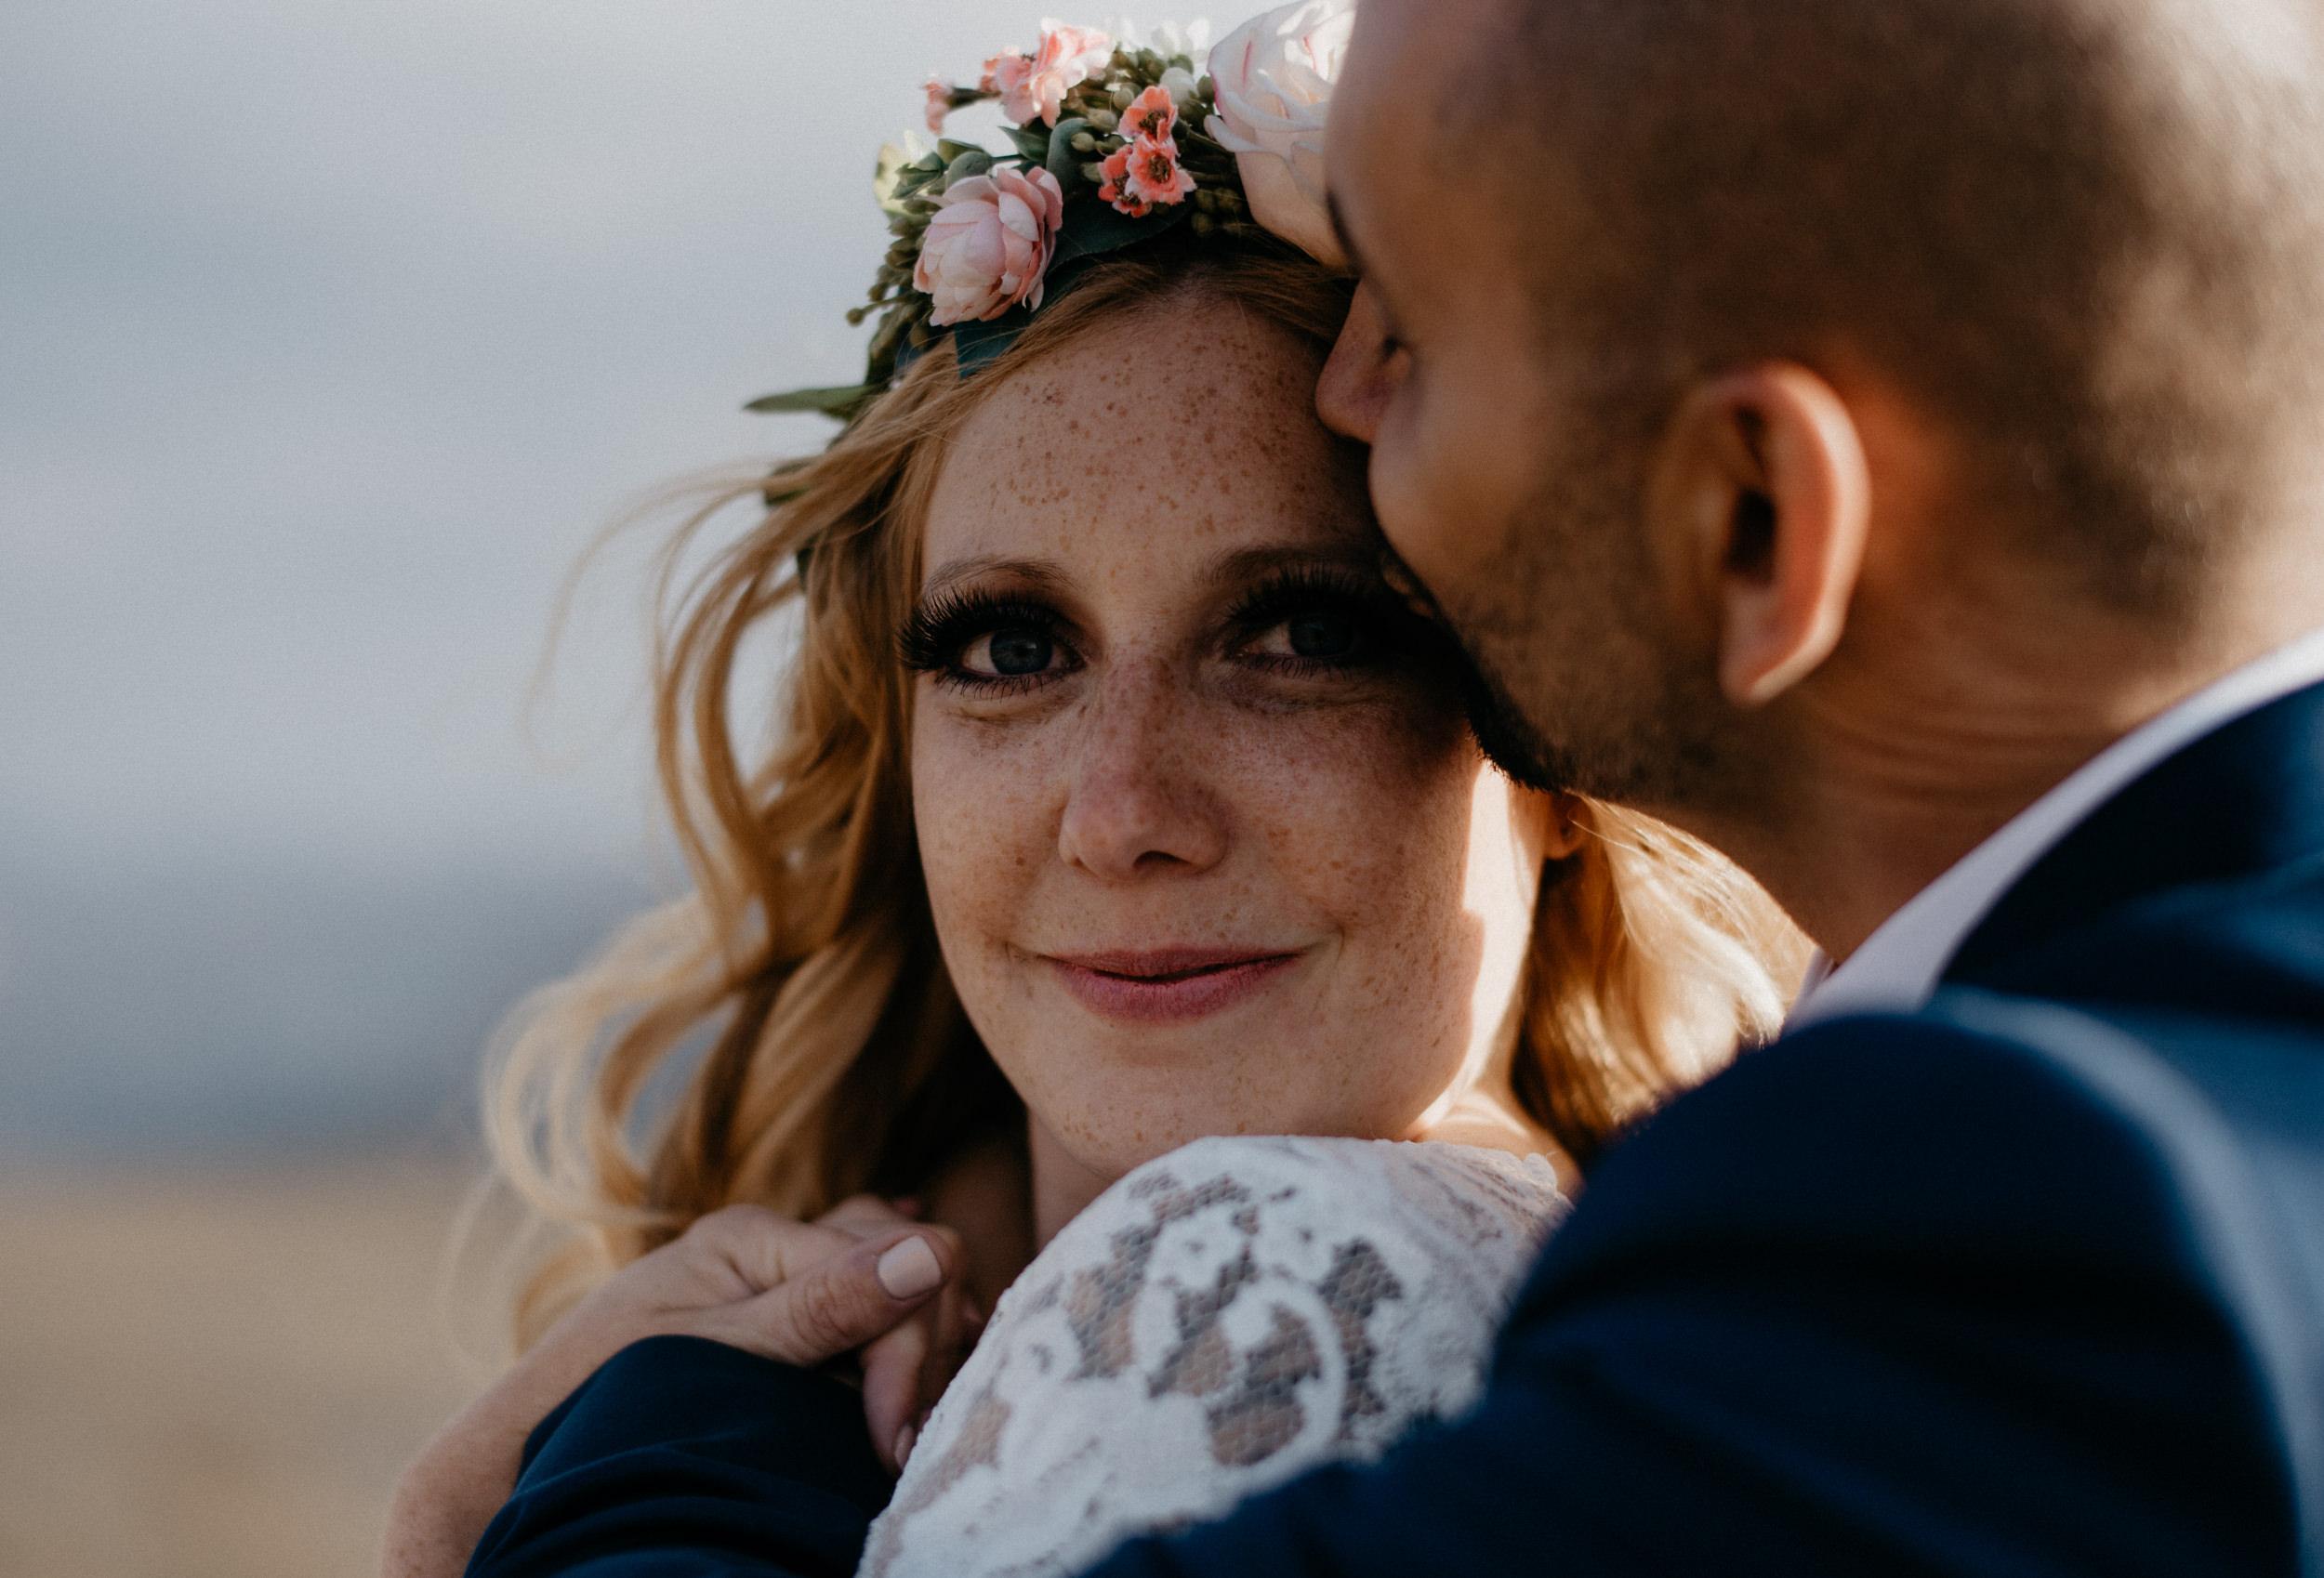 Colorado wedding photographer. Mountain elopements and ceremonies.